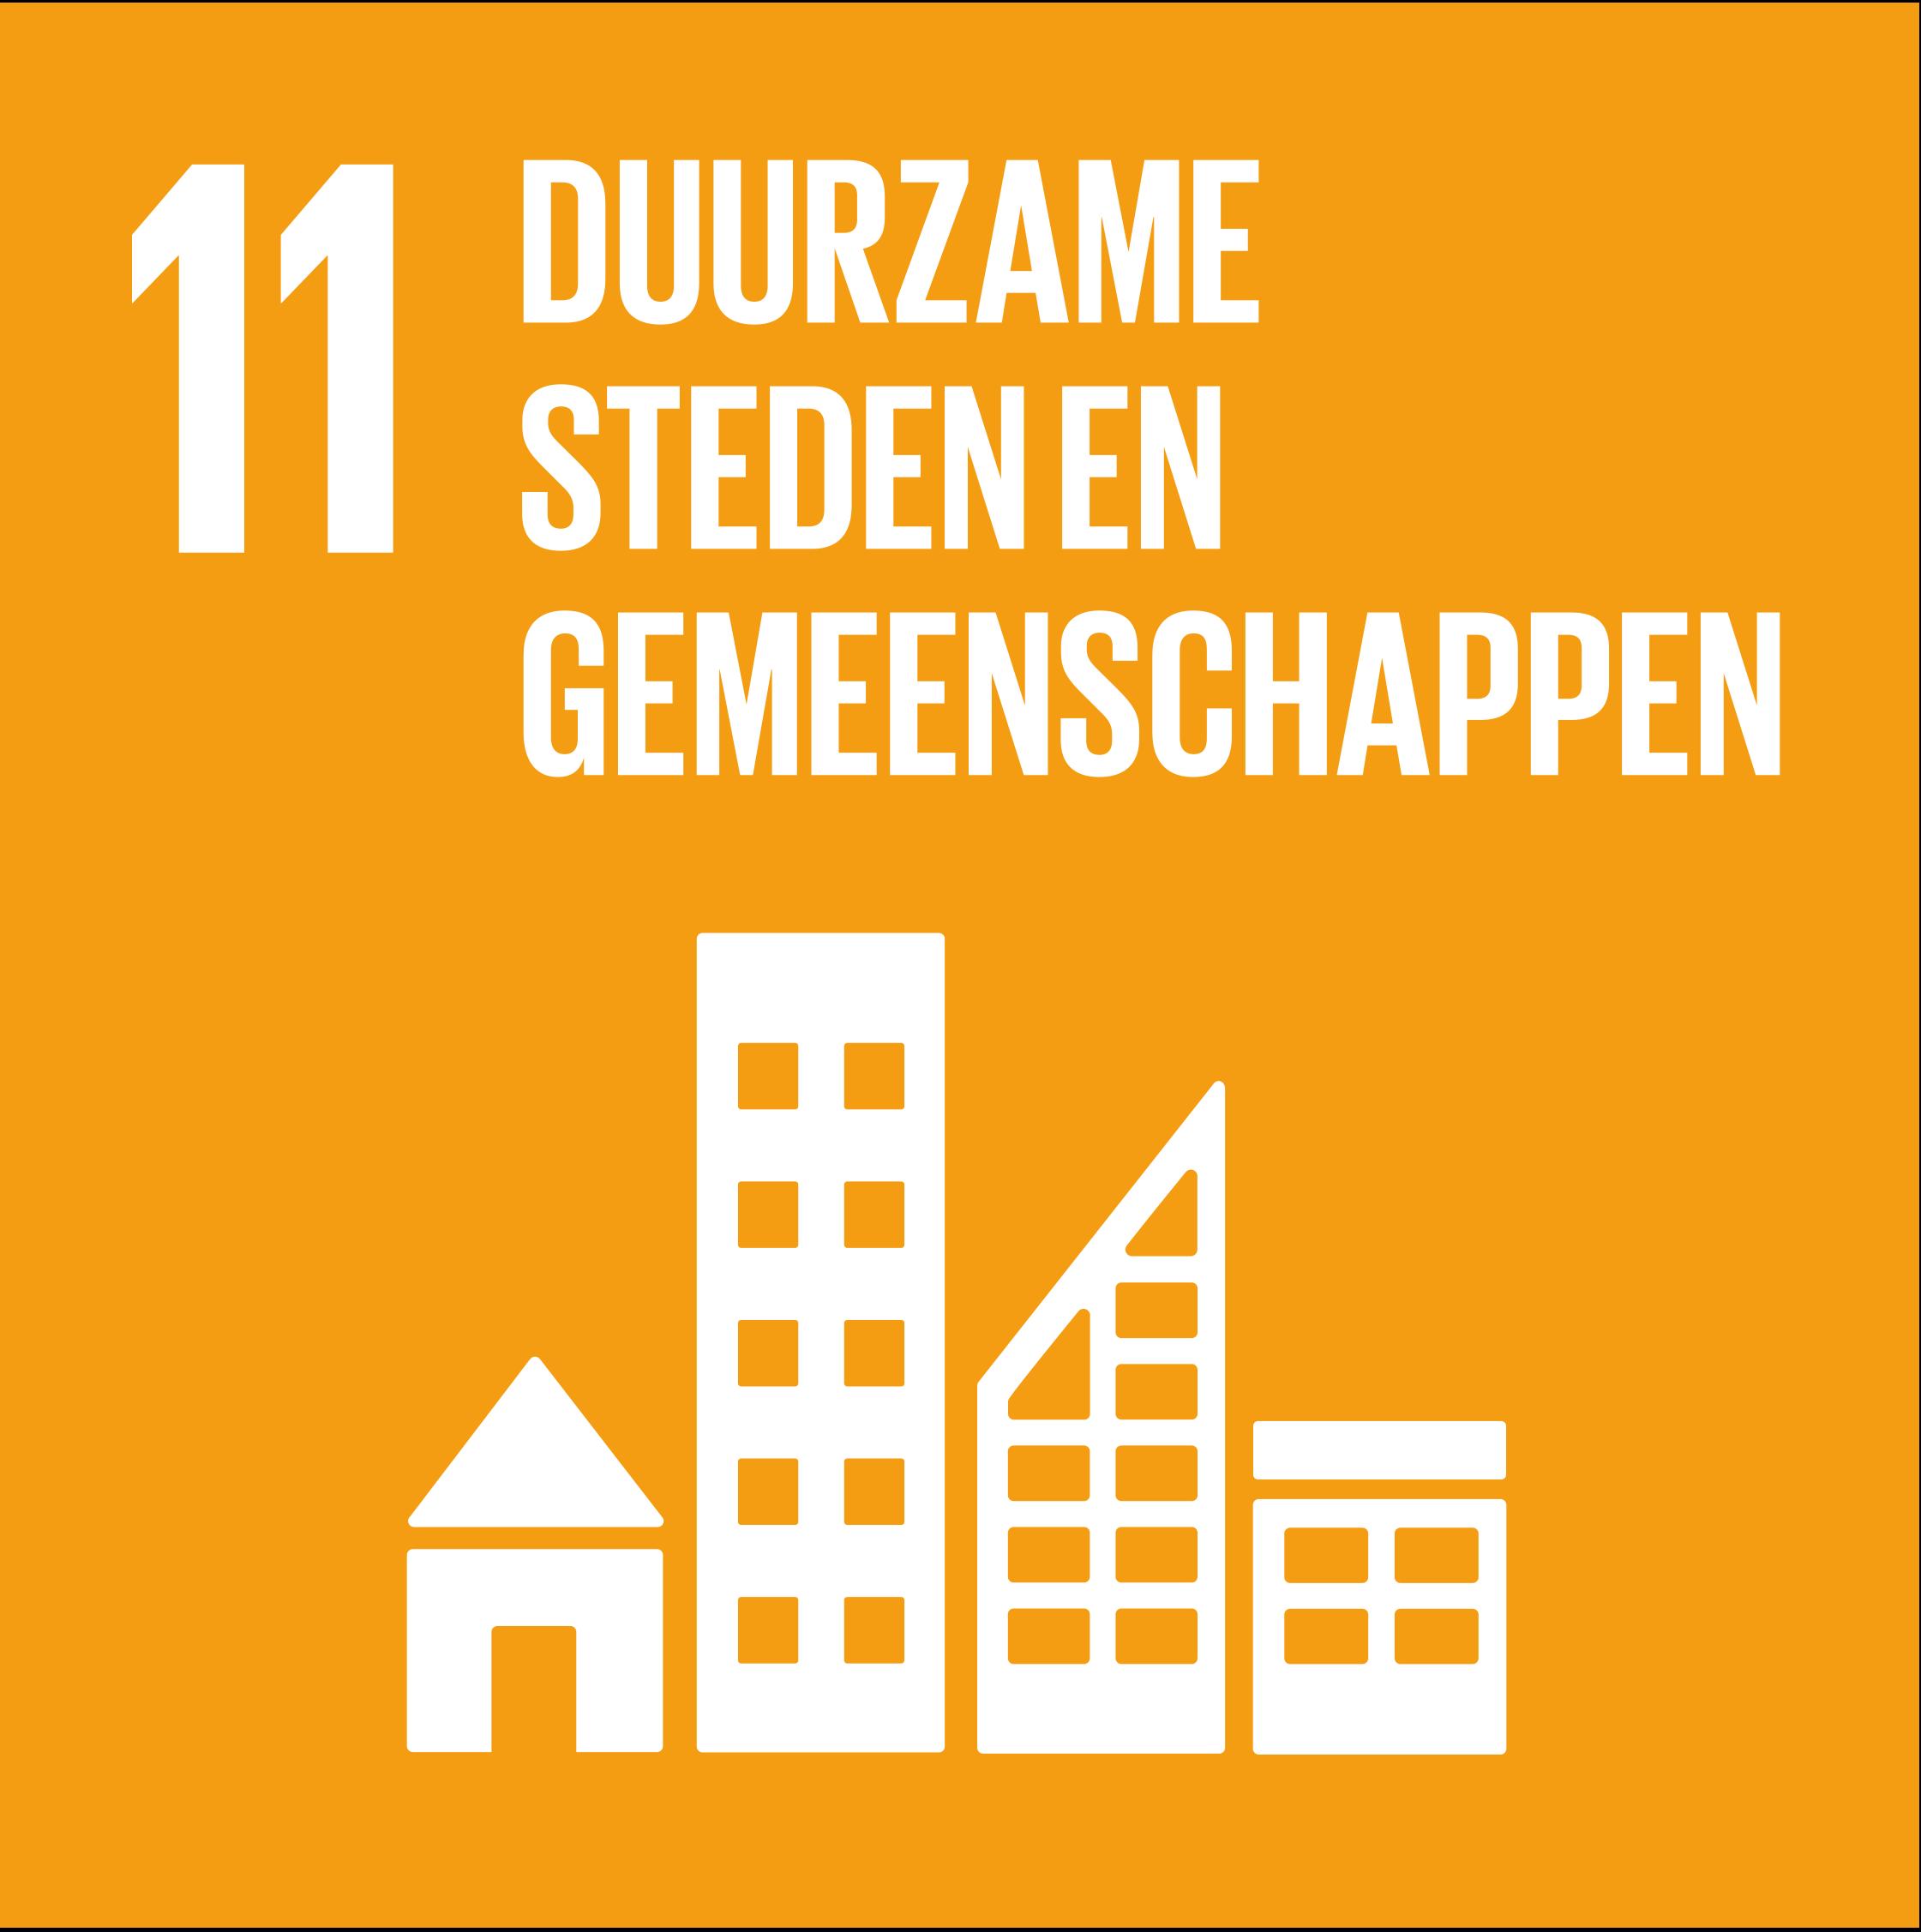 SDG_11.png